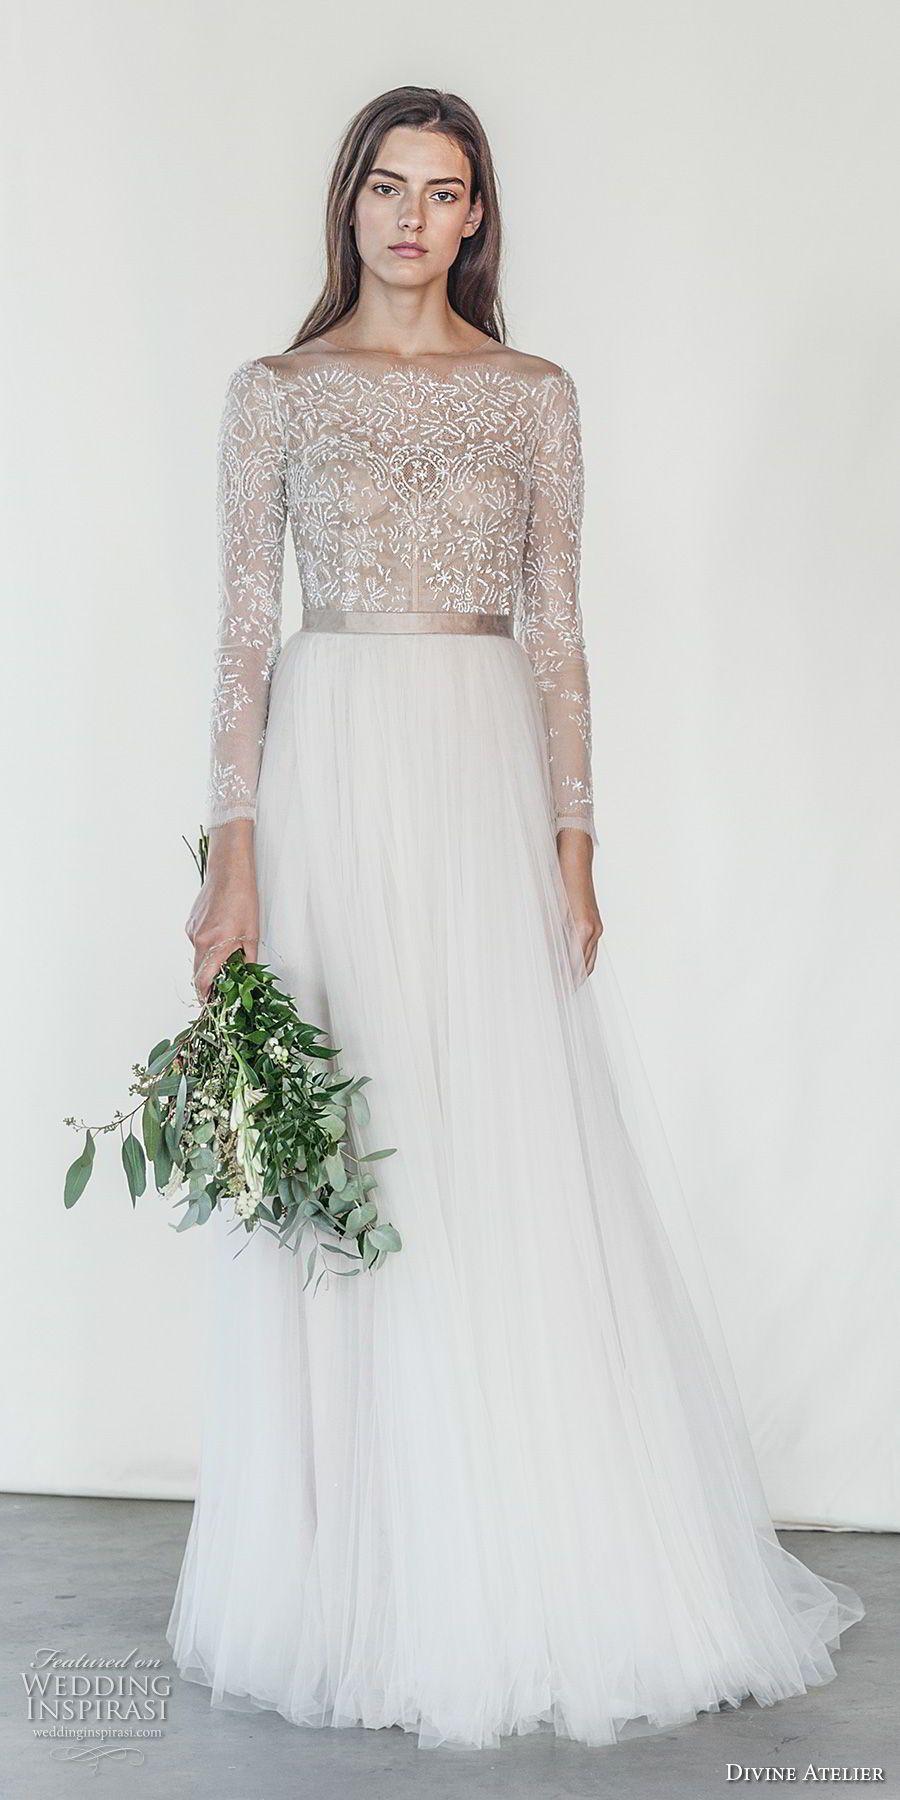 Sheer long sleeve wedding dresses  divine atelier  bridal long sleeves bateau neck heavily